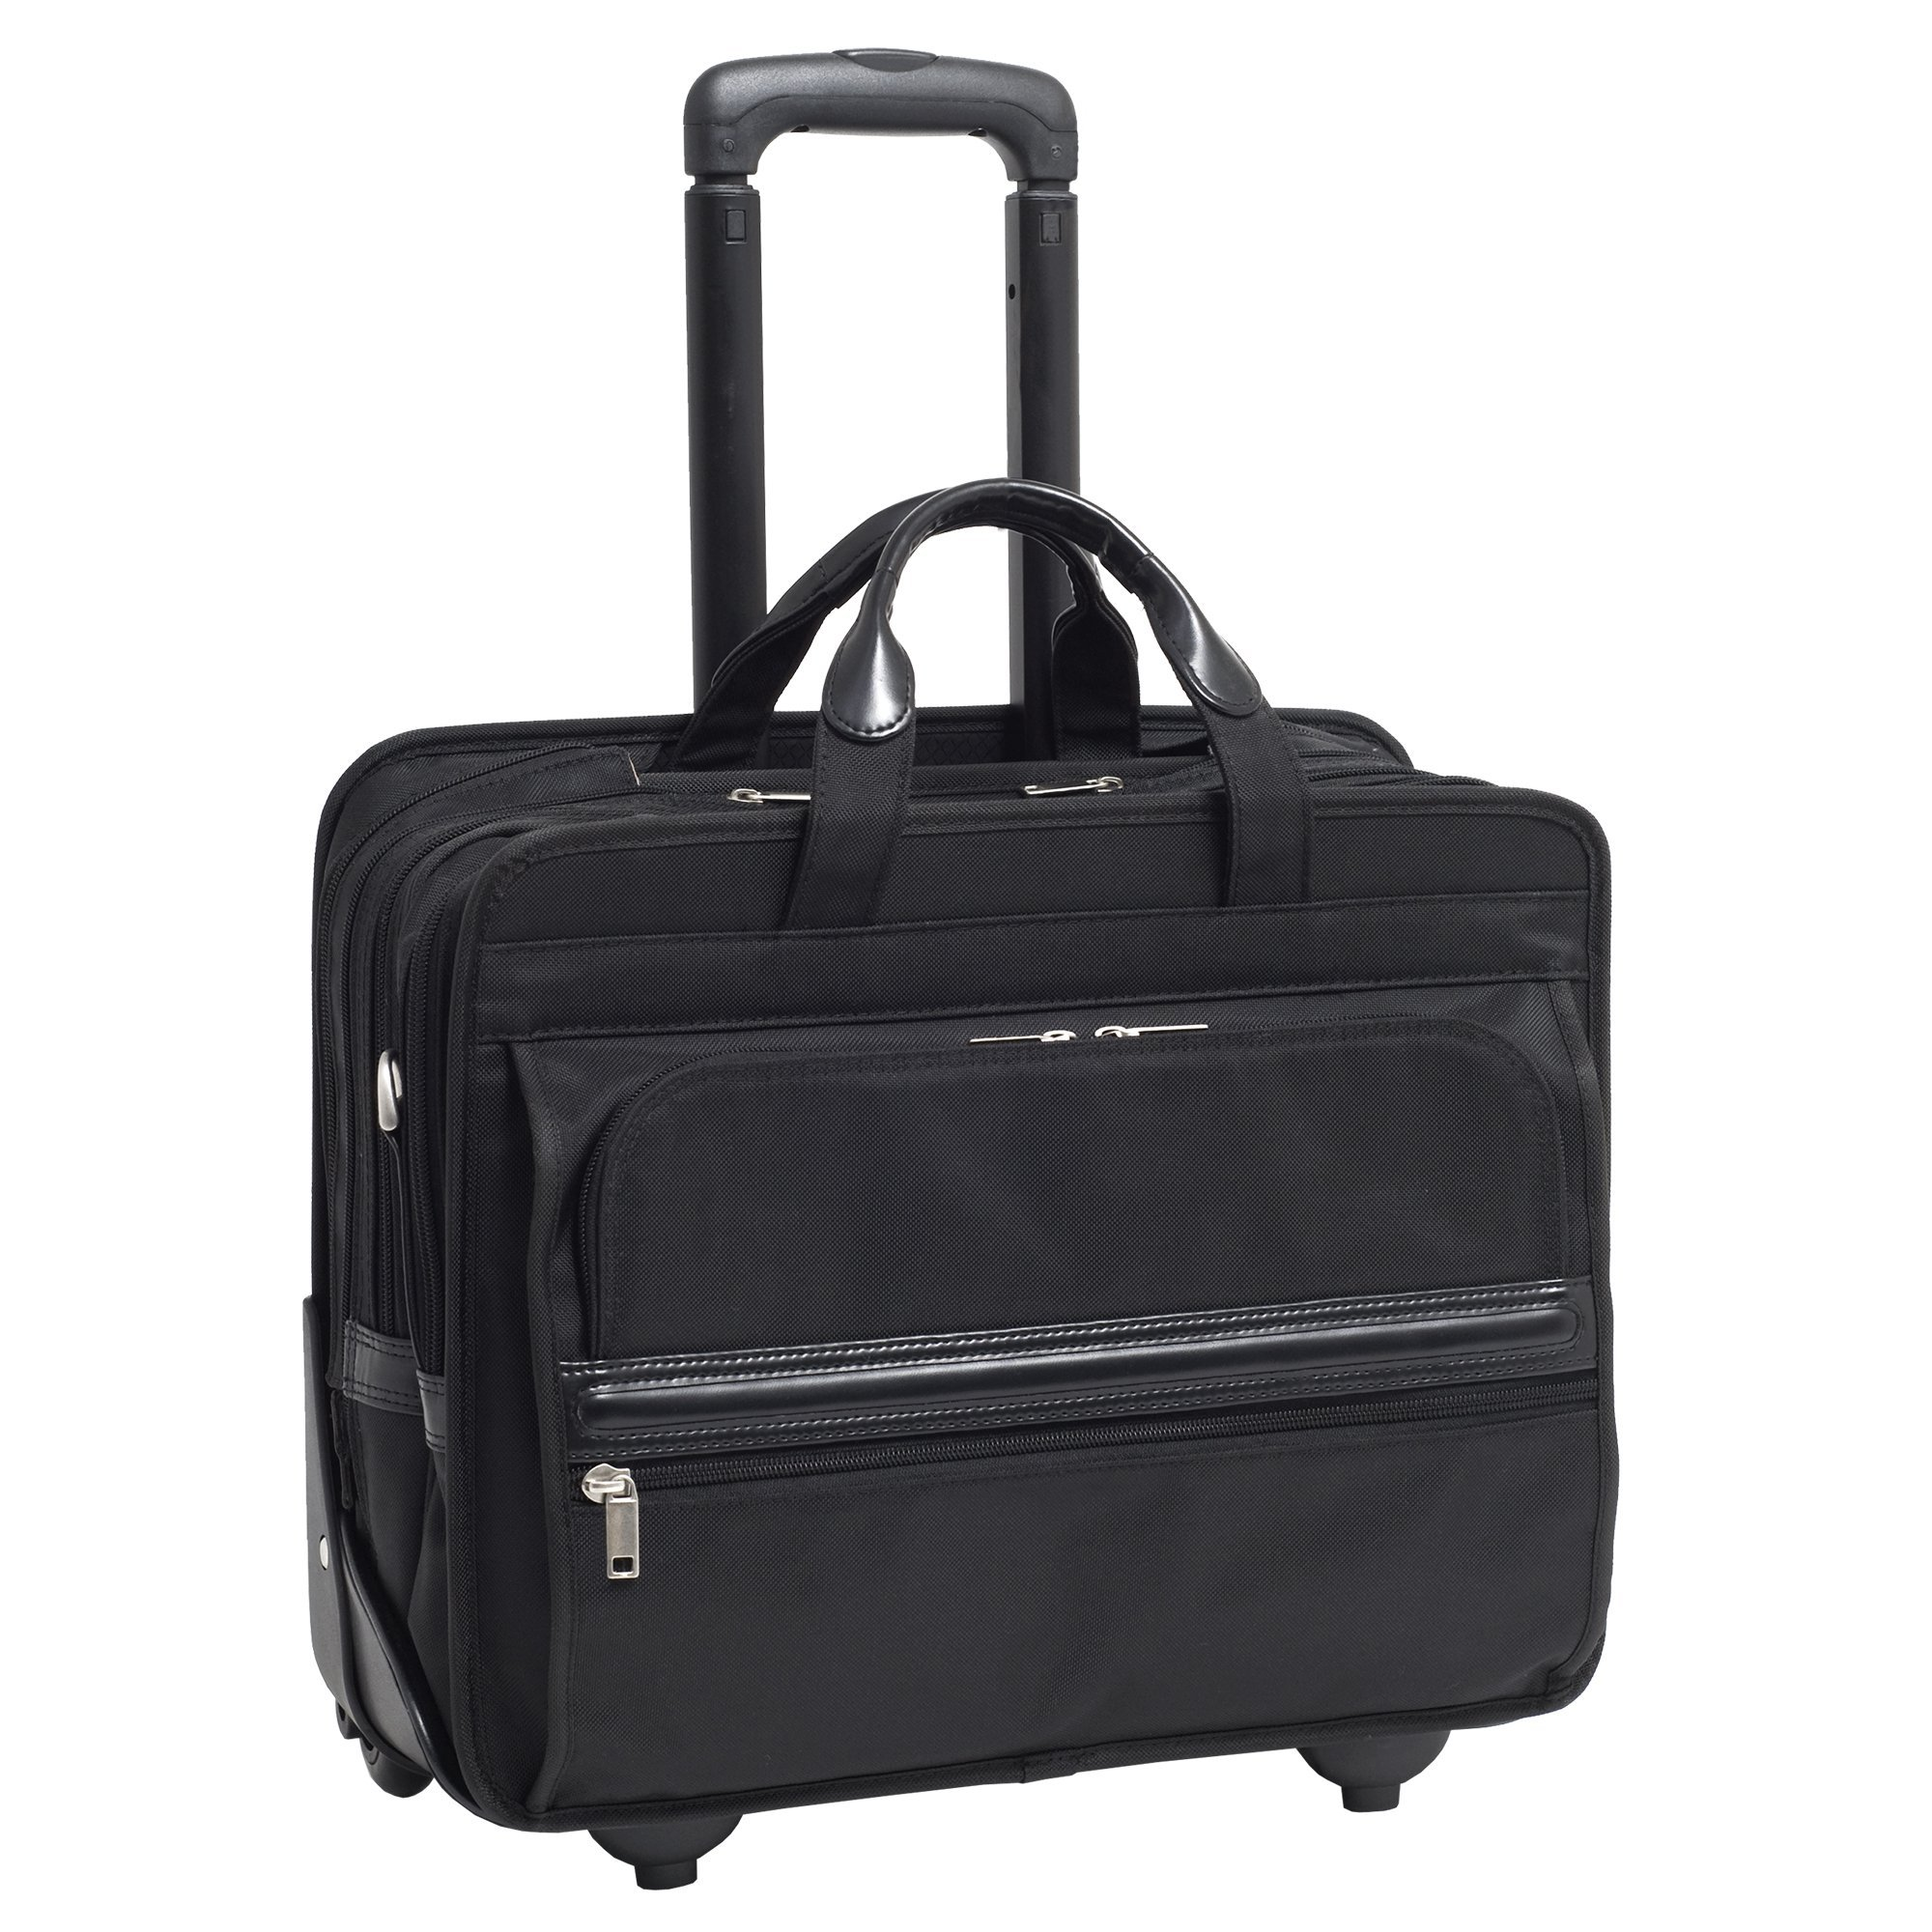 McKleinUSA FRANKLIN 56445 Black Nylon 17 Detachable-Wheeled Laptop Case US PATENT # 6,595,334